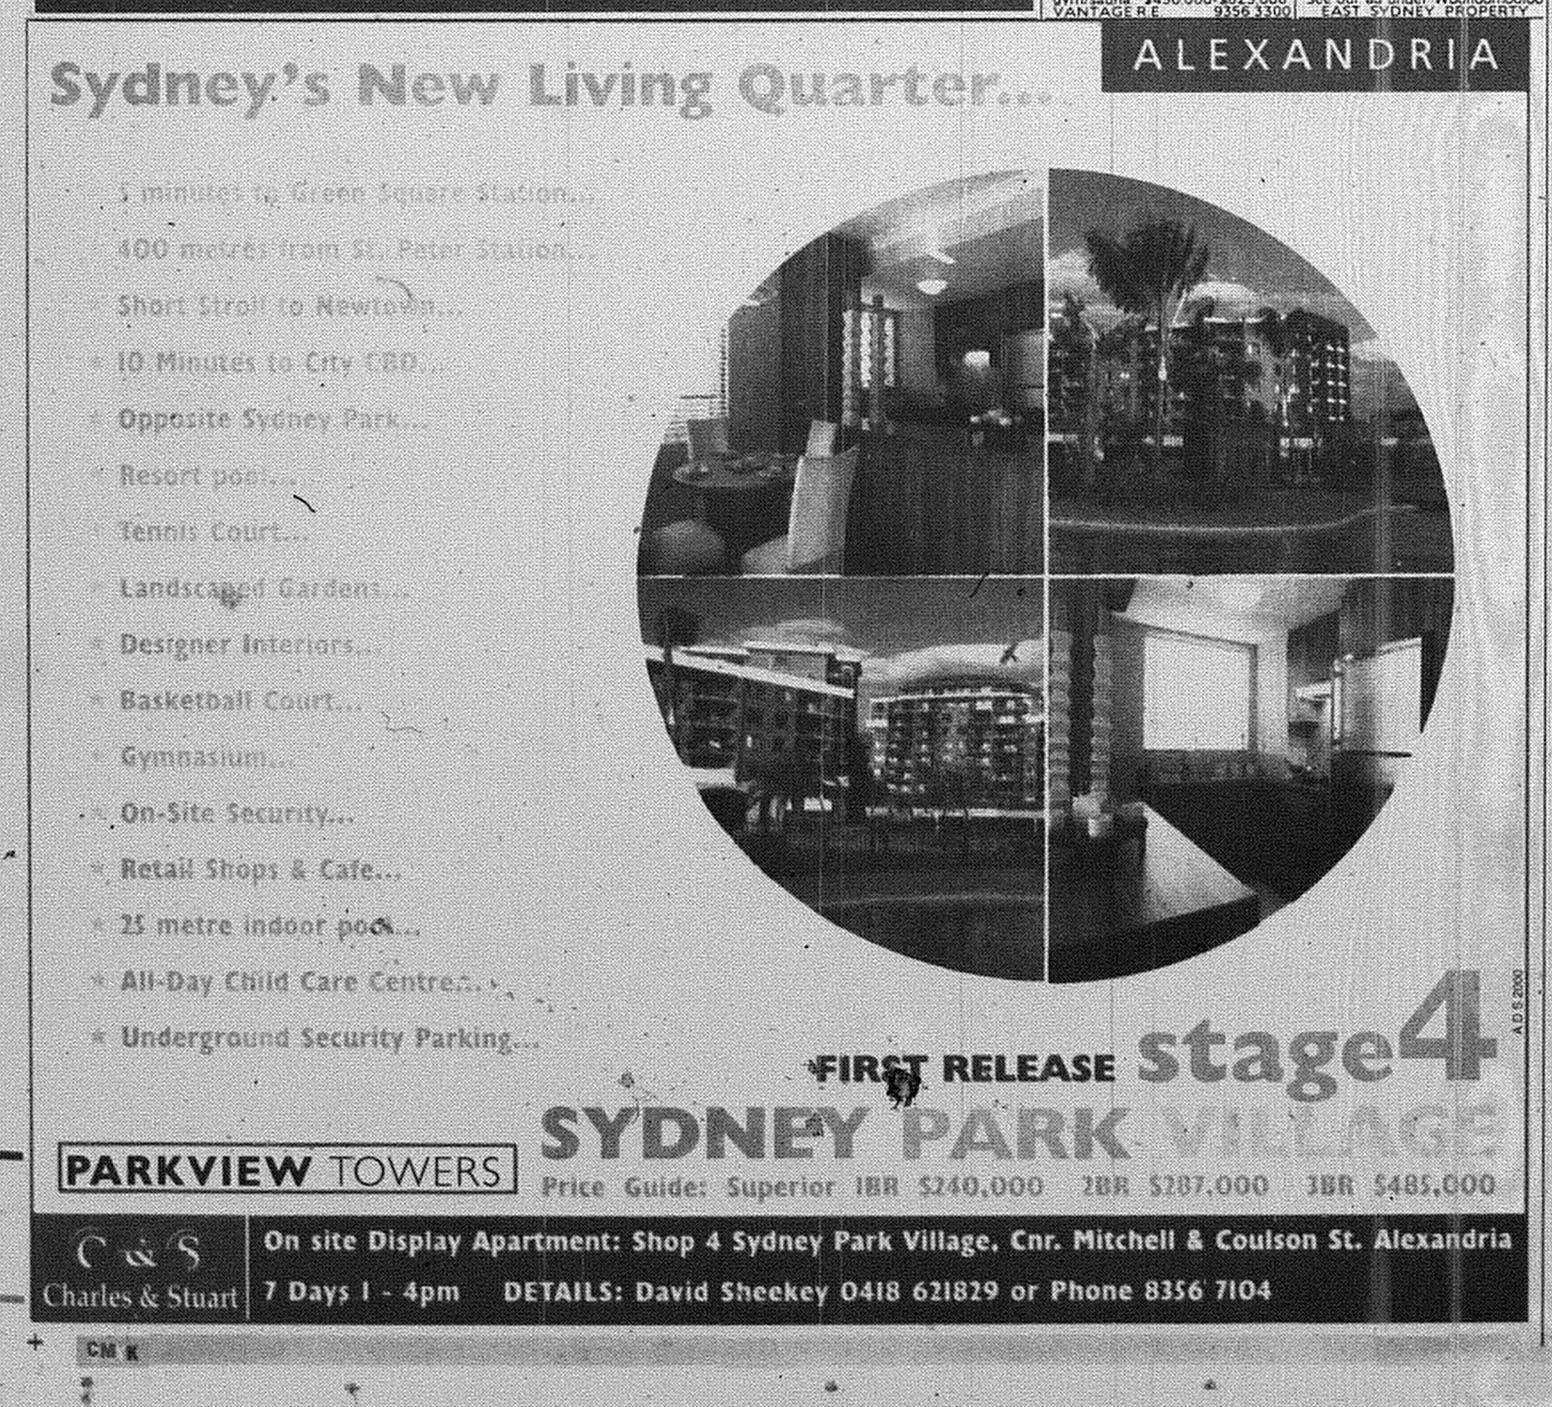 Sydney Park apartments ad september 25 1999 smh 23RE